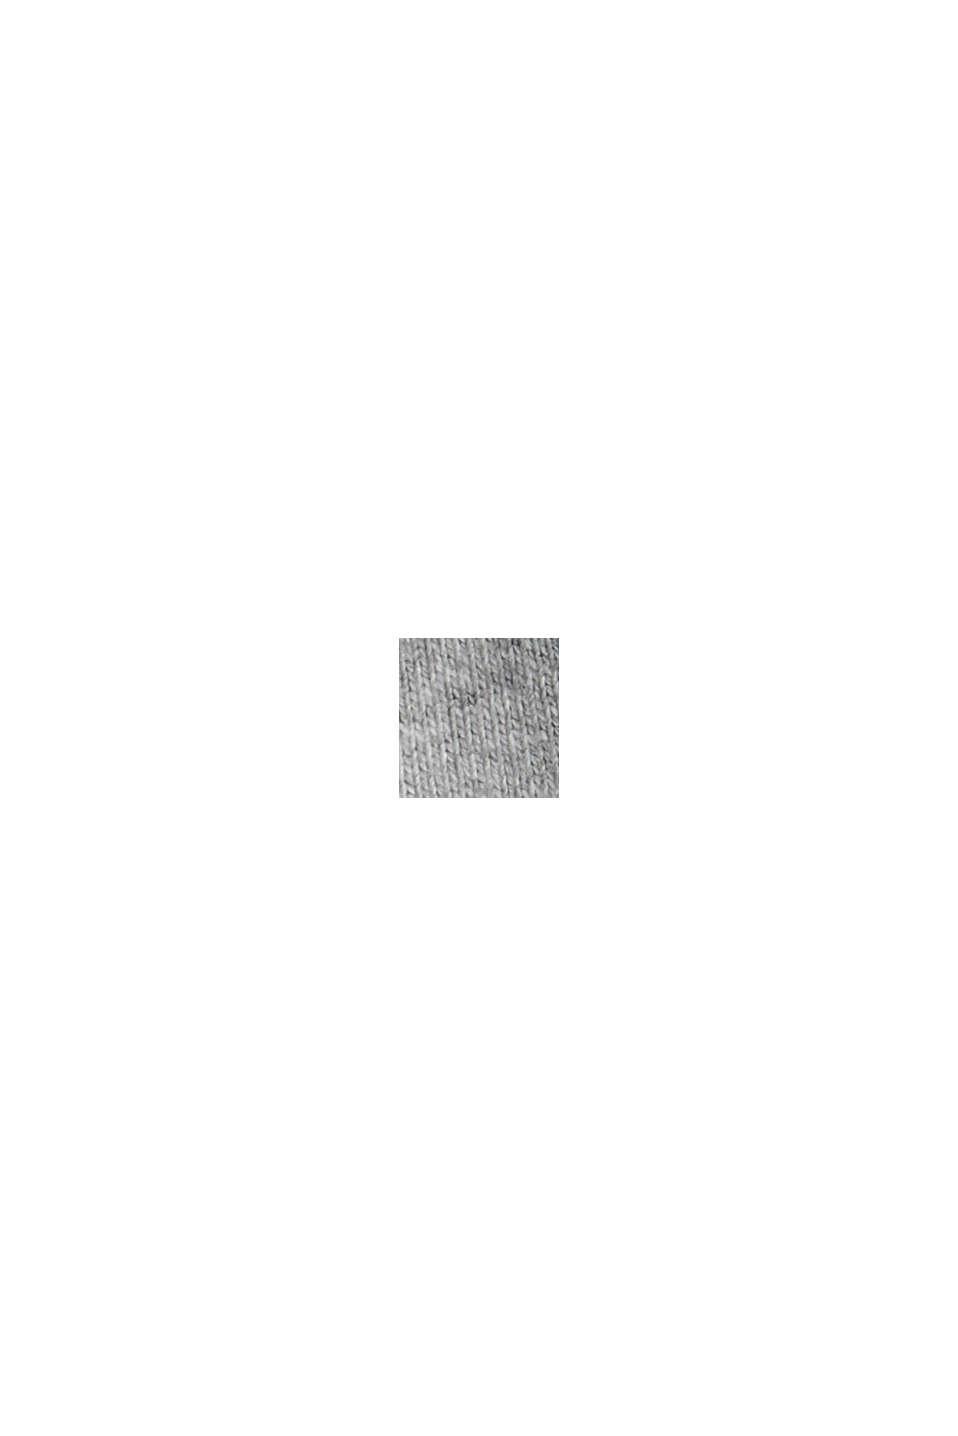 Sobrecamisa de felpa en mezcla de algodón, LIGHT GREY, swatch